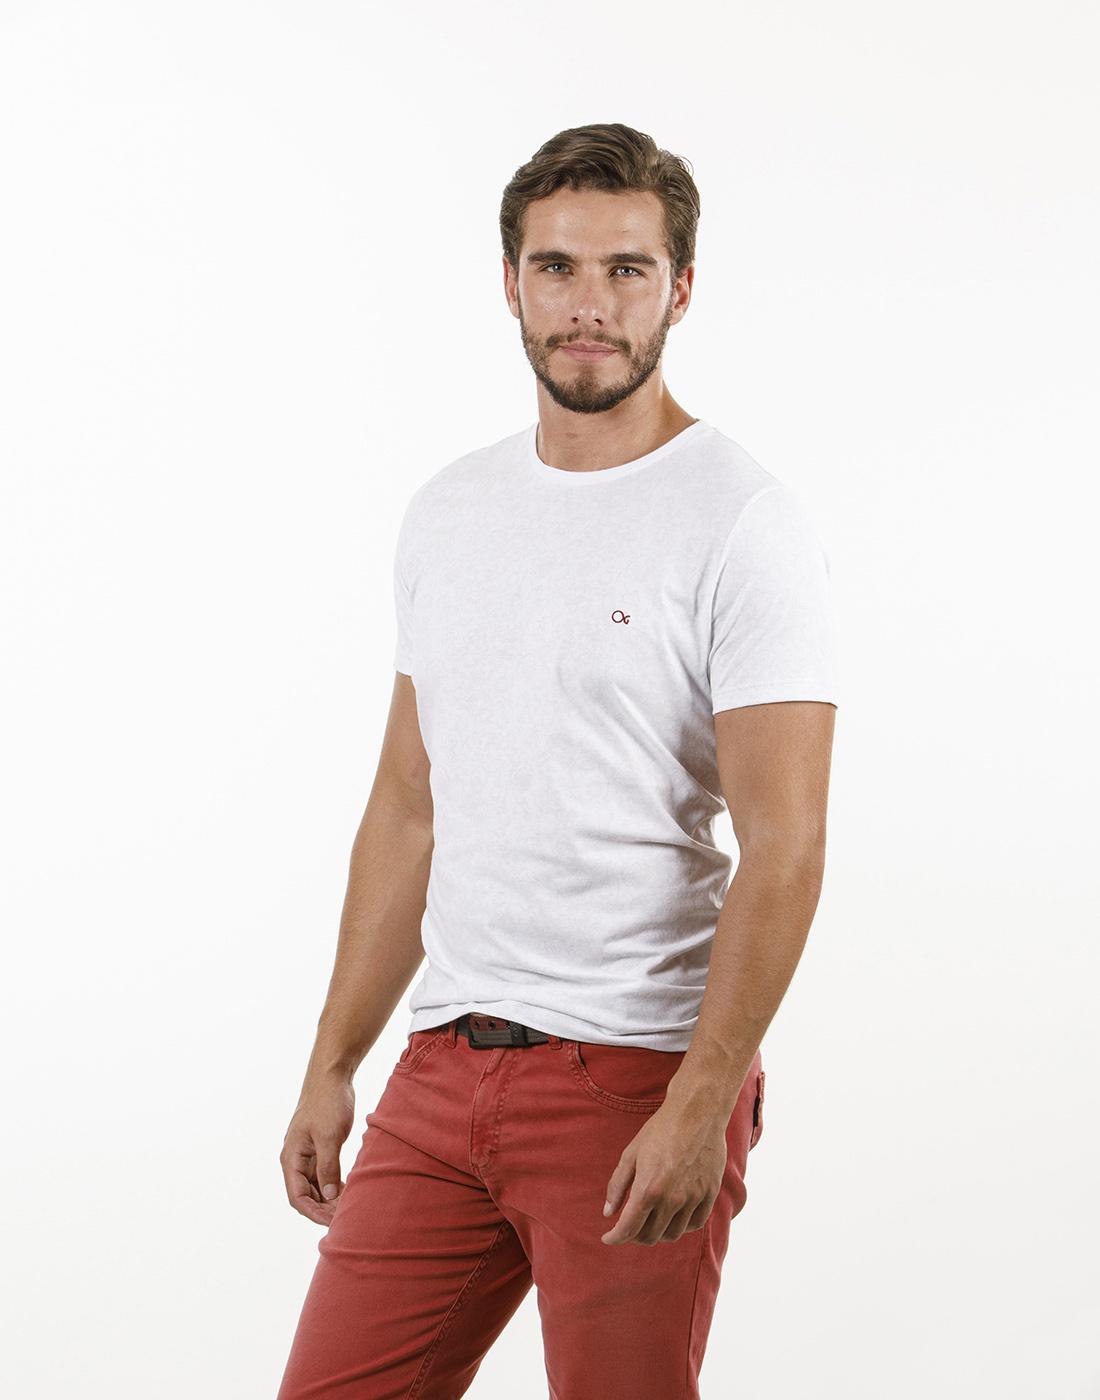 Camiseta Concept Gola O. Estampada Slim Branco Ogochi